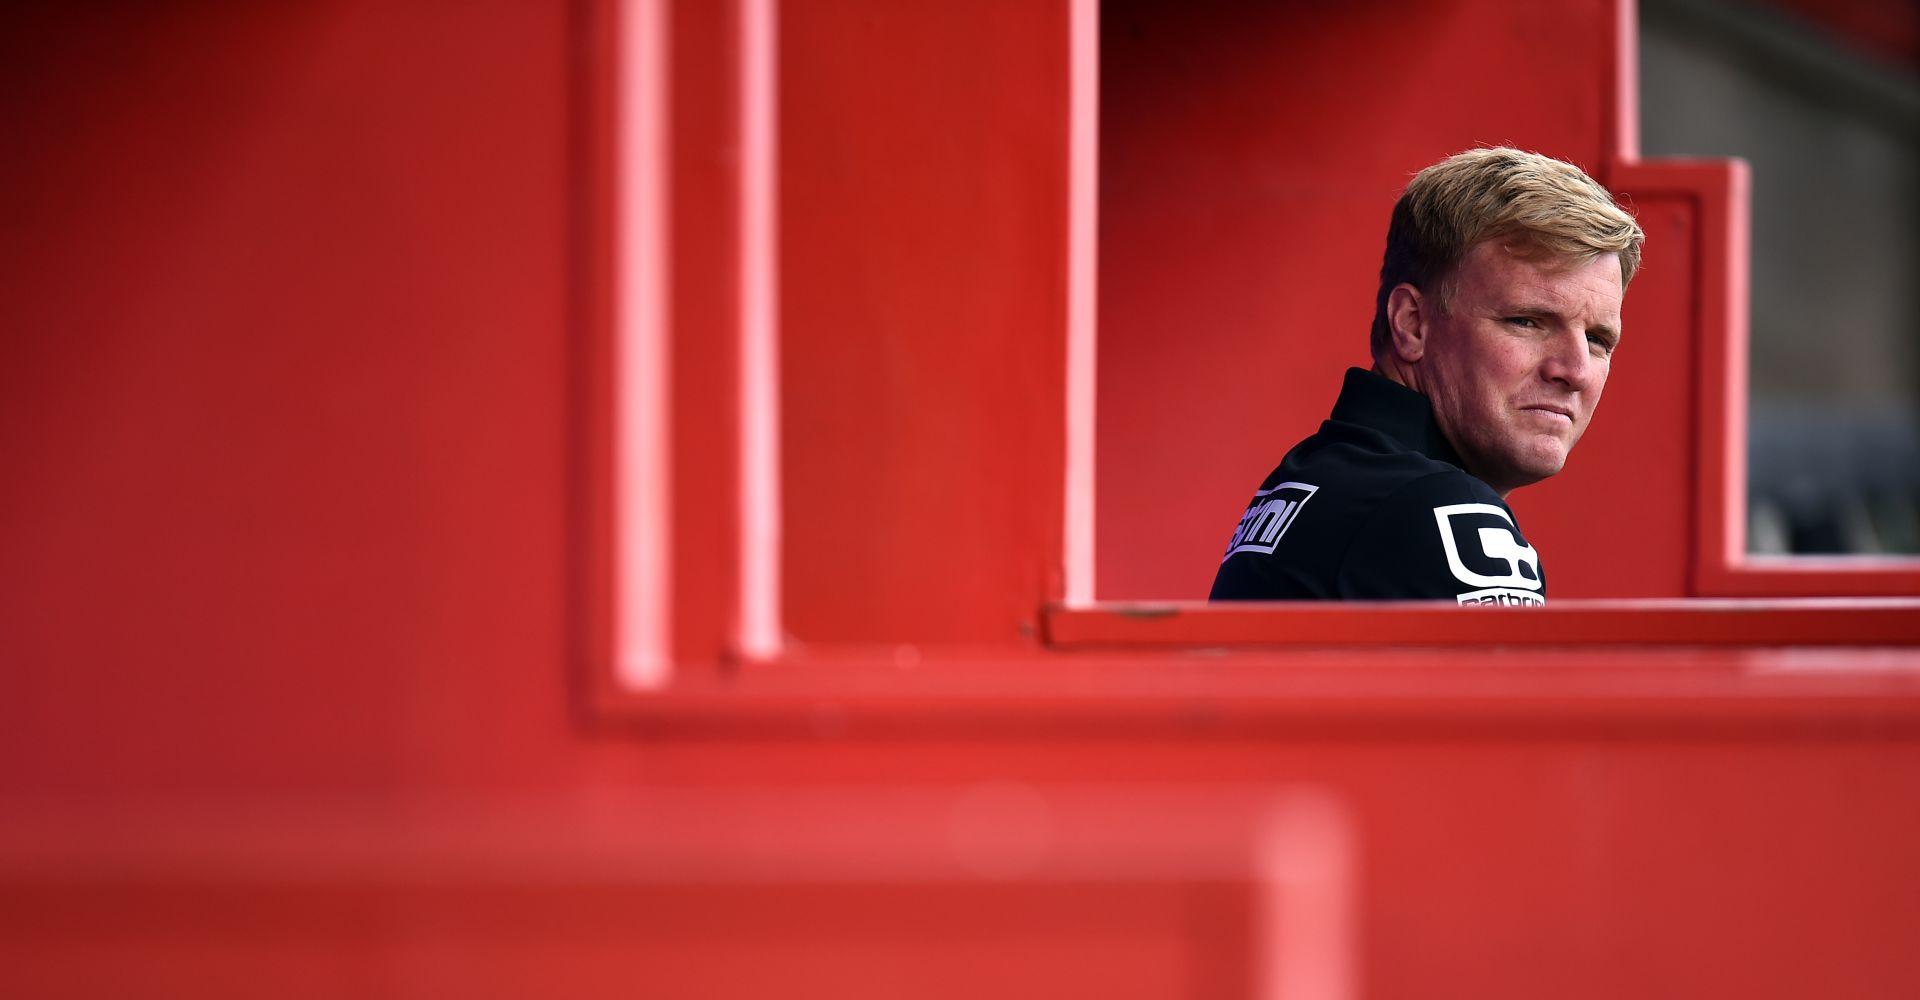 West Ham vs Bournemouth odds